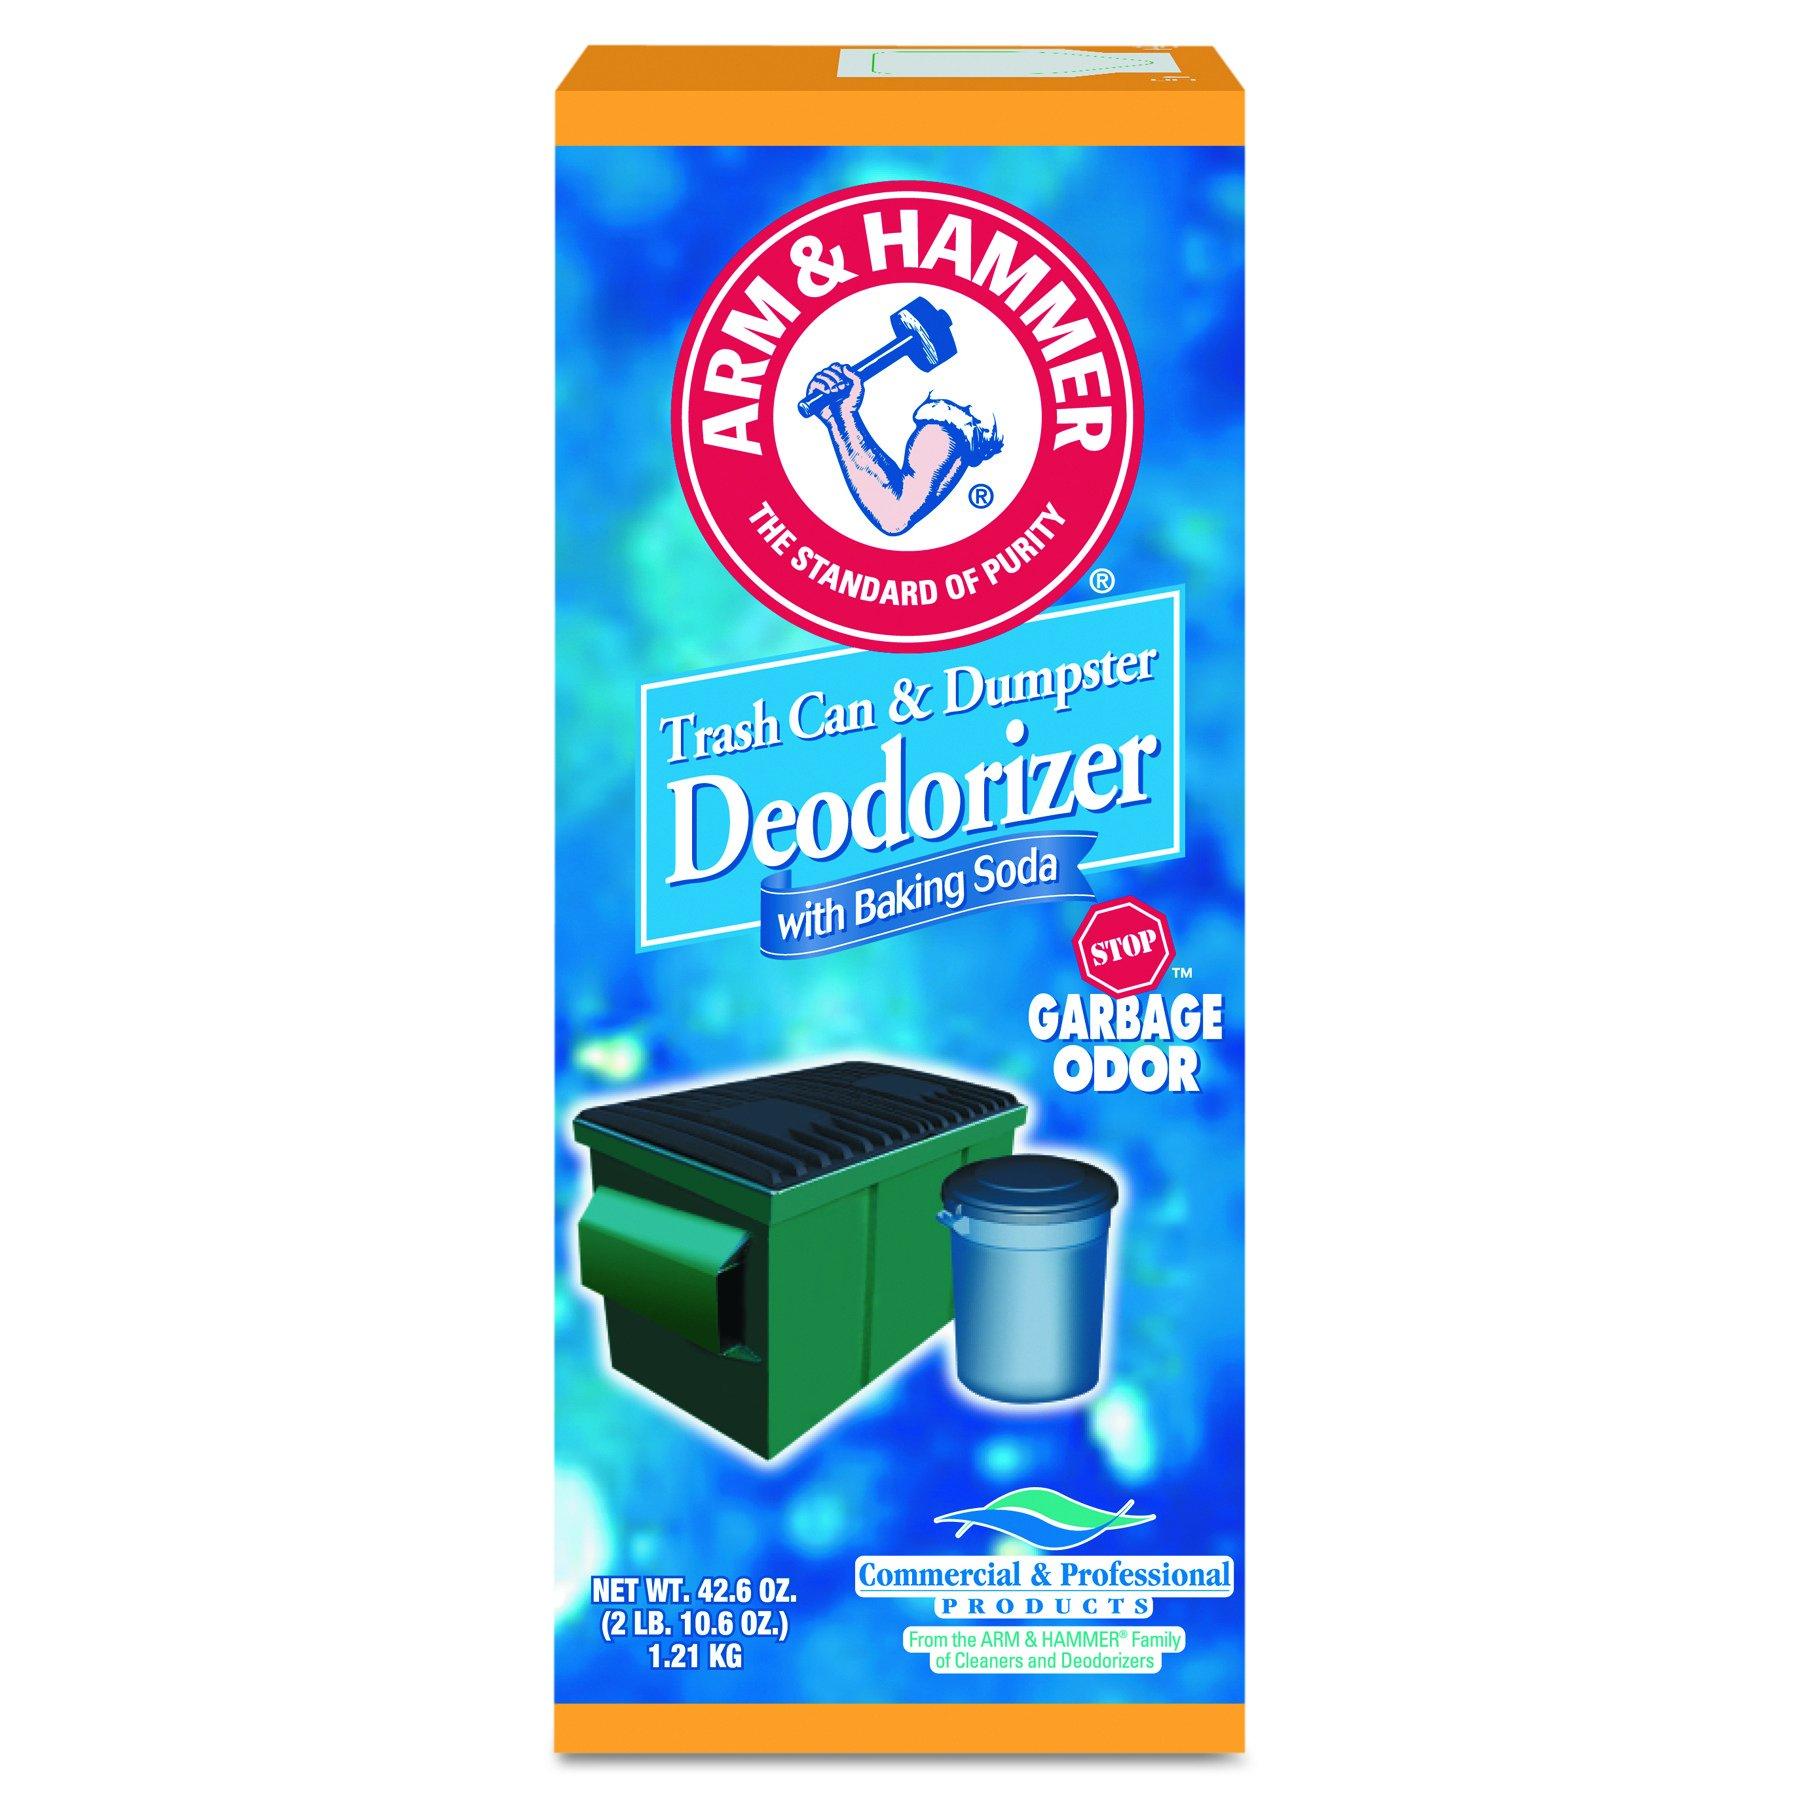 Arm & Hammer 3320084116CT Trash Can & Dumpster Deodorizer, Sprinkle Top, Original, Powder, 42.6 oz (Case of 9)